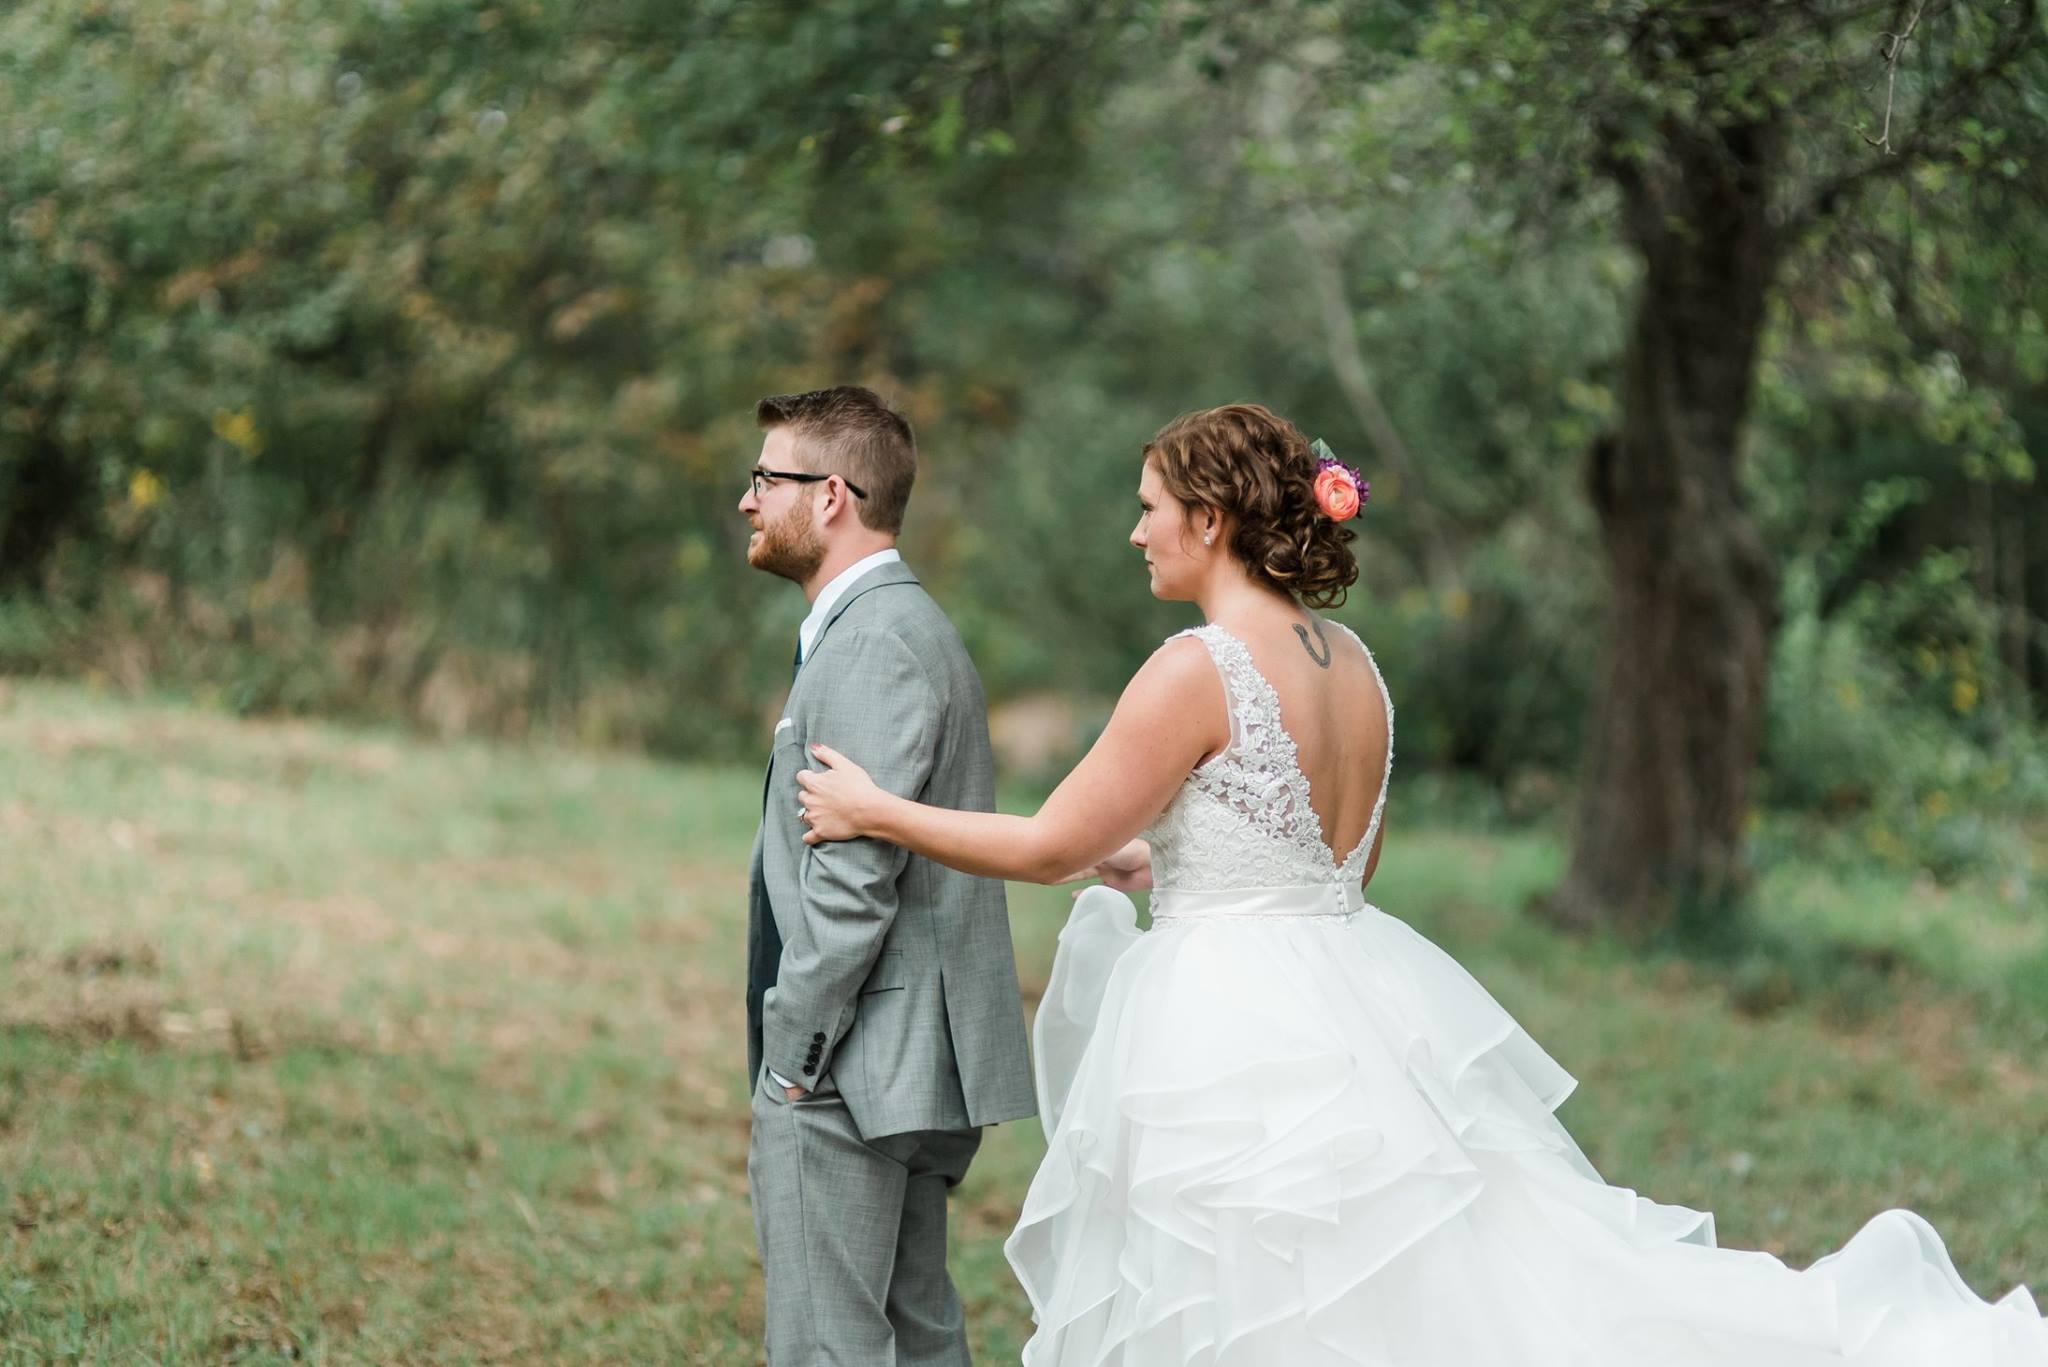 pennsylvania-backyard-wedding-love-diy-bohemian-romantic-colorful-0010.jpg